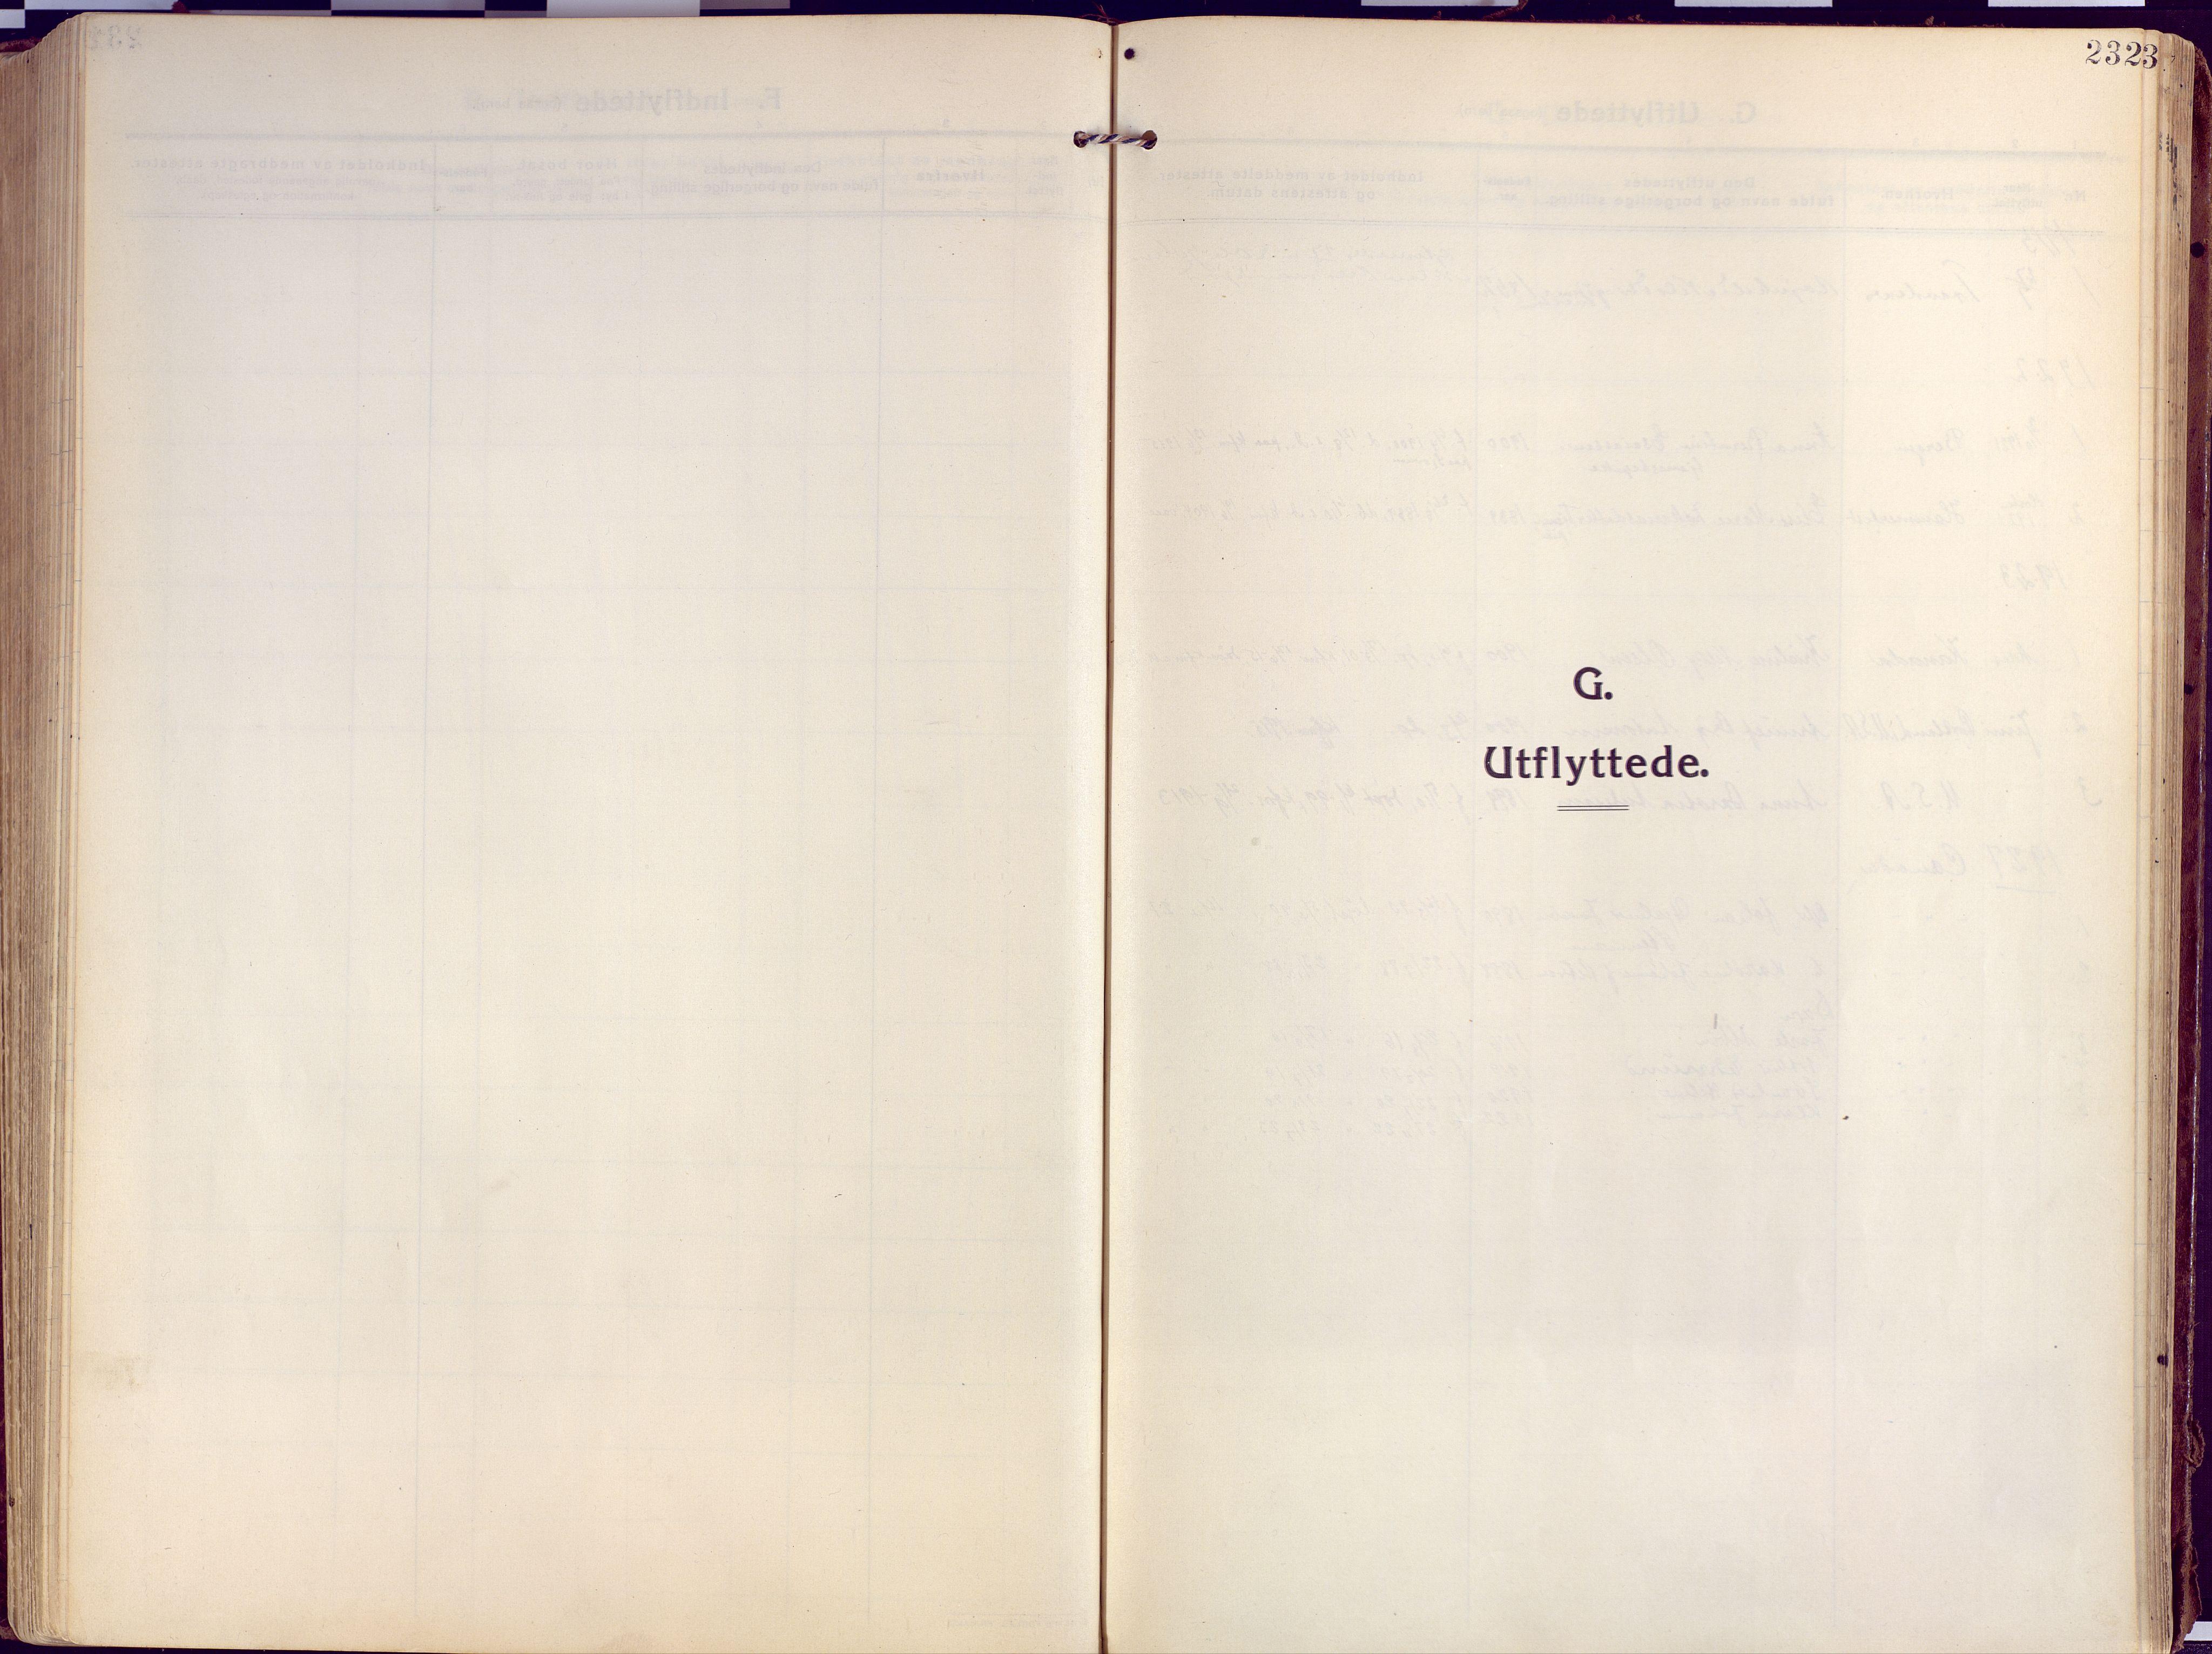 SATØ, Salangen sokneprestembete, Ministerialbok nr. 4, 1912-1927, s. 232